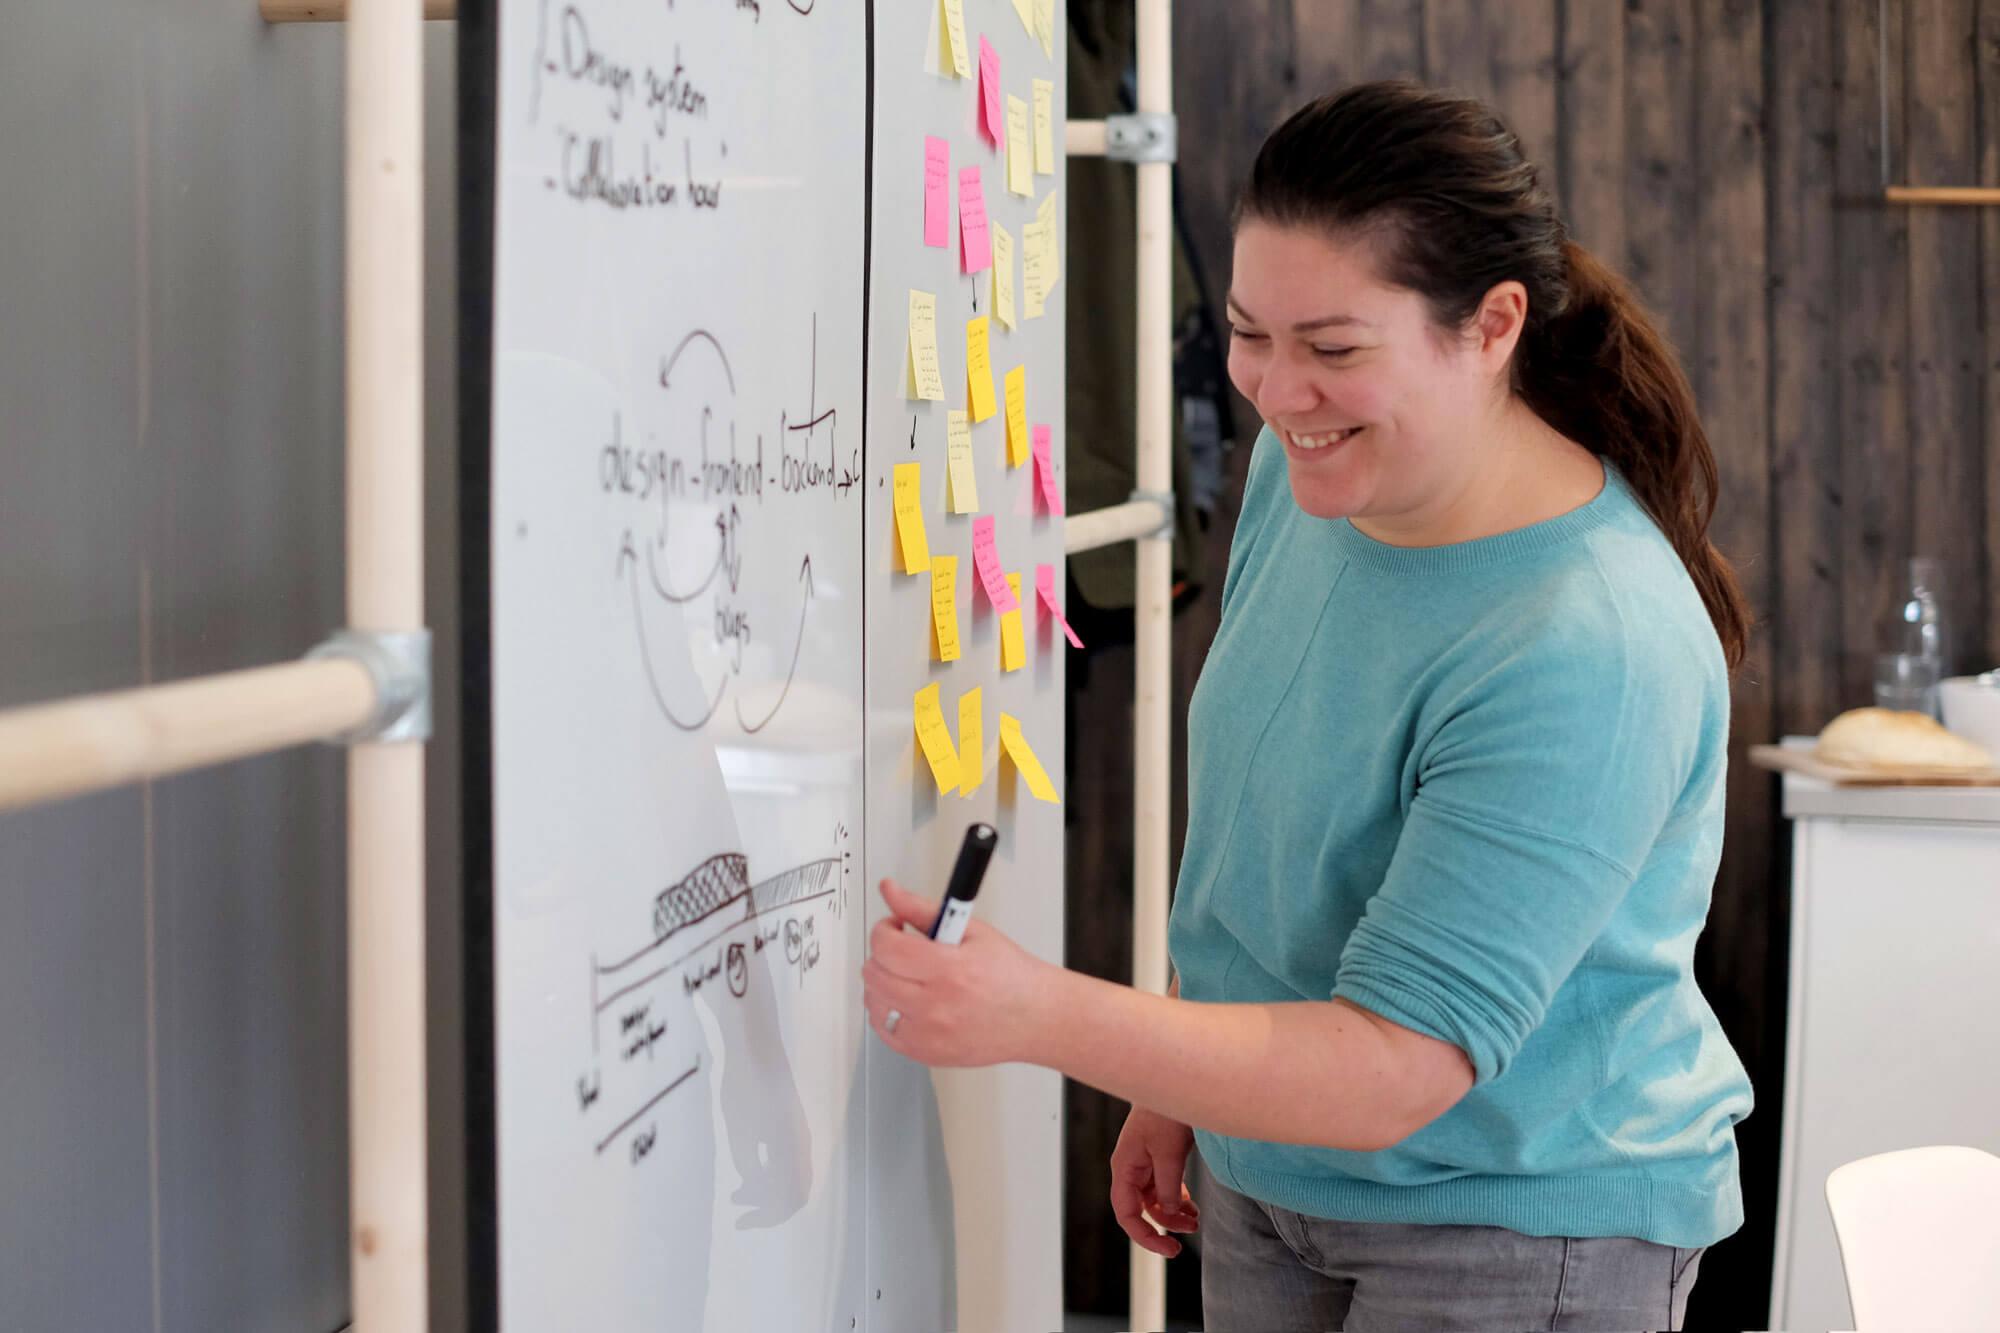 Lieneke schetst ons werkproces op een whiteboard